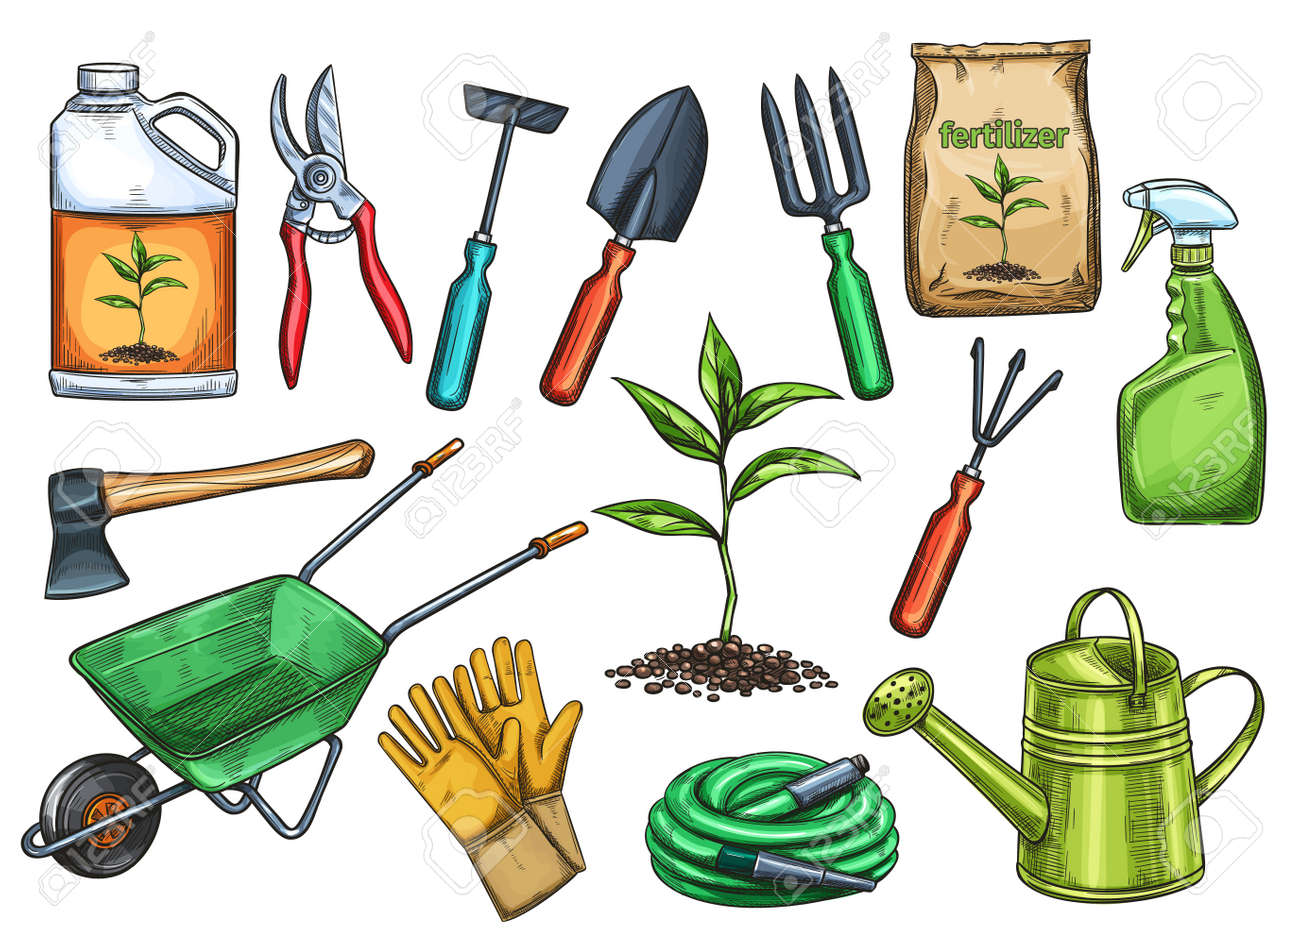 Gardening Tools Vector Illustration Royalty Free Cliparts